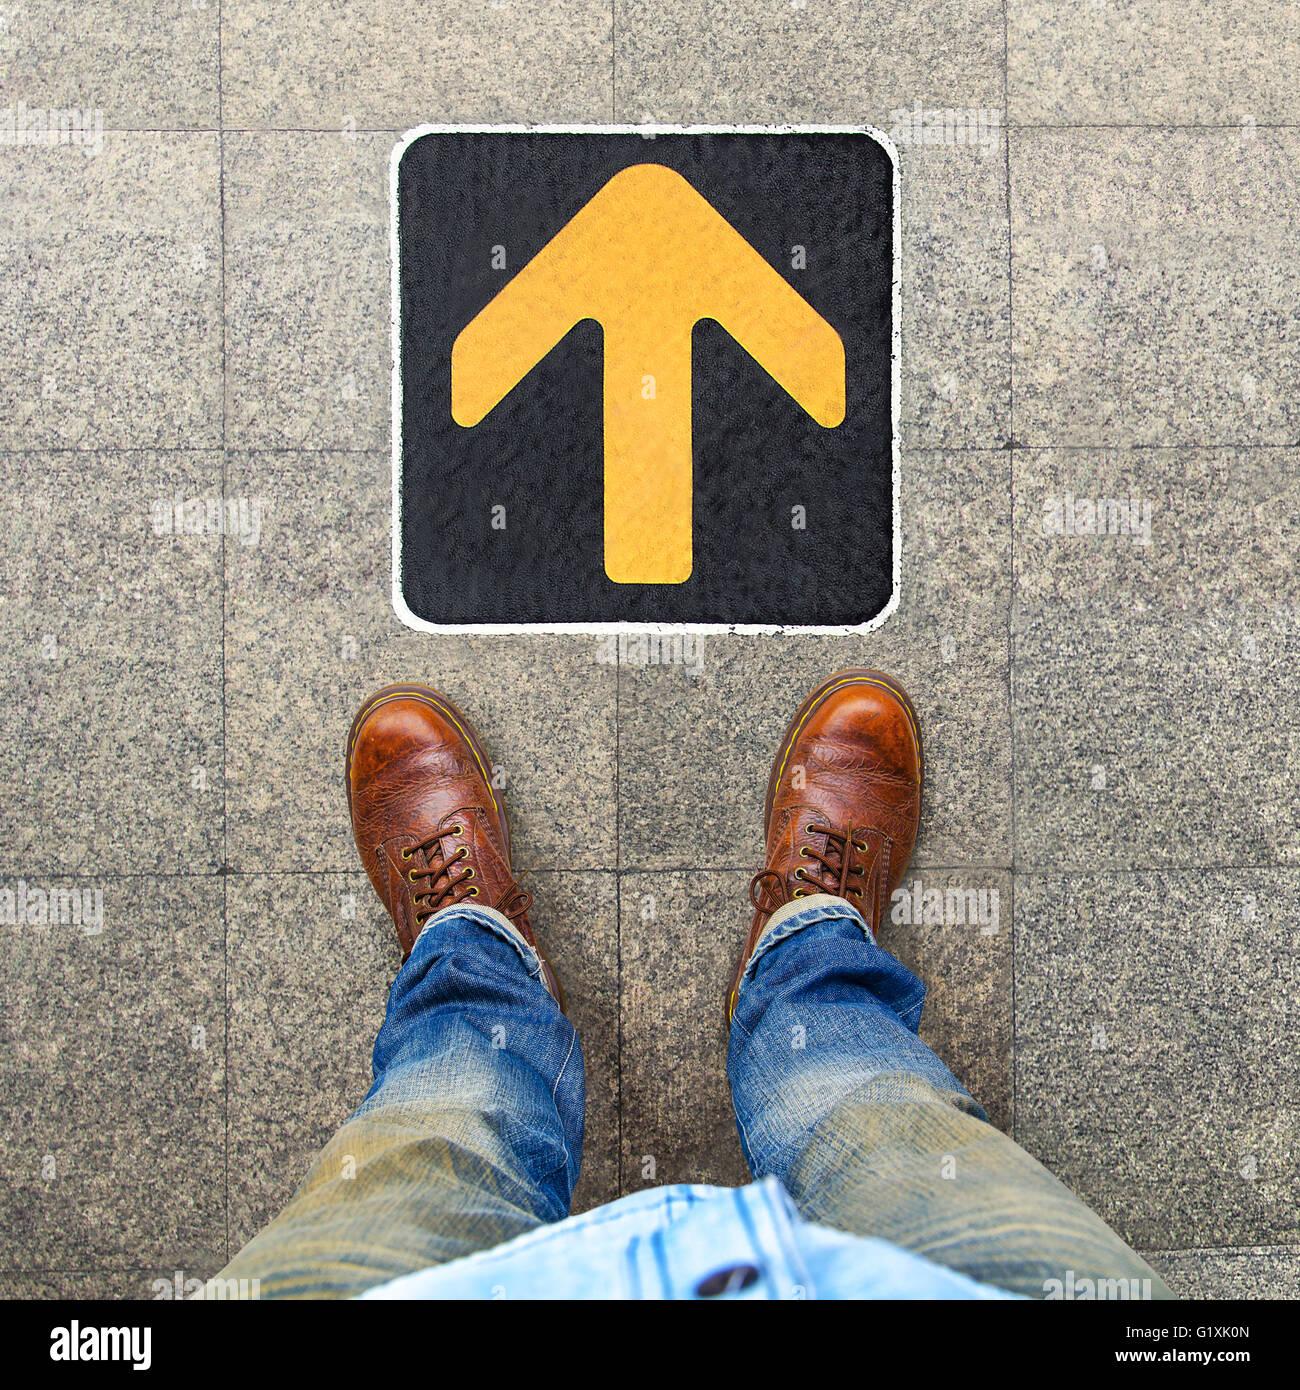 Flecha amarilla para indicar el recorrido de la flecha Imagen De Stock